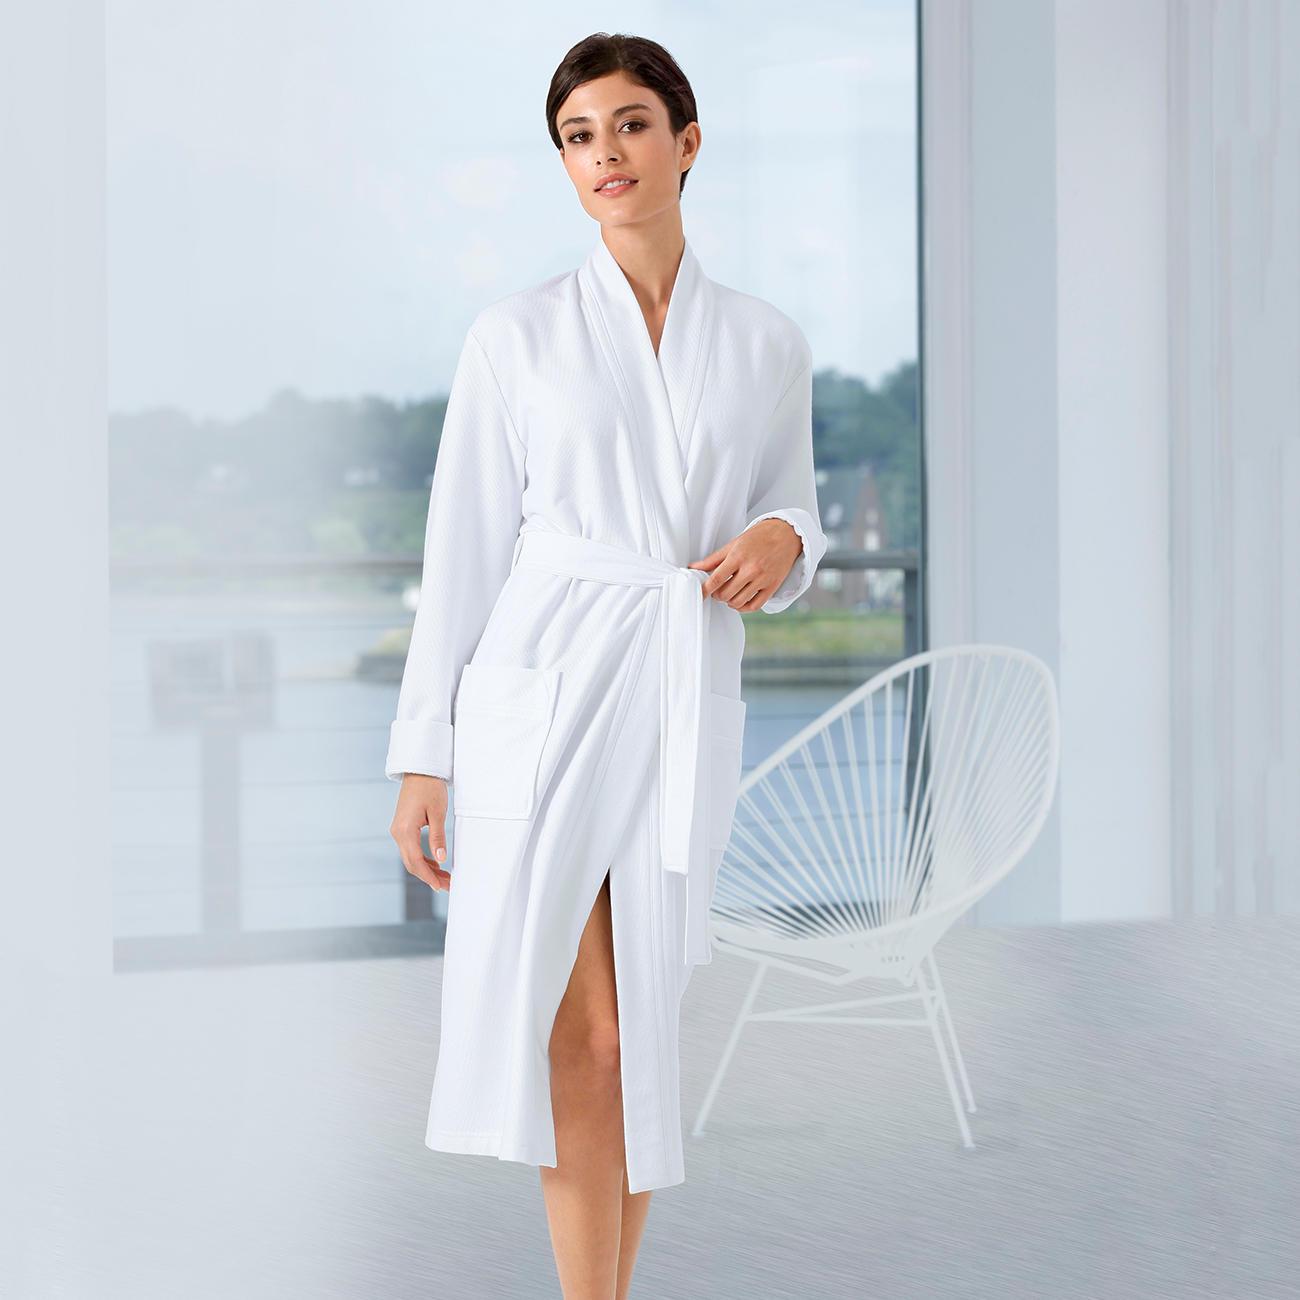 taubert light bademantel mode klassiker entdecken. Black Bedroom Furniture Sets. Home Design Ideas